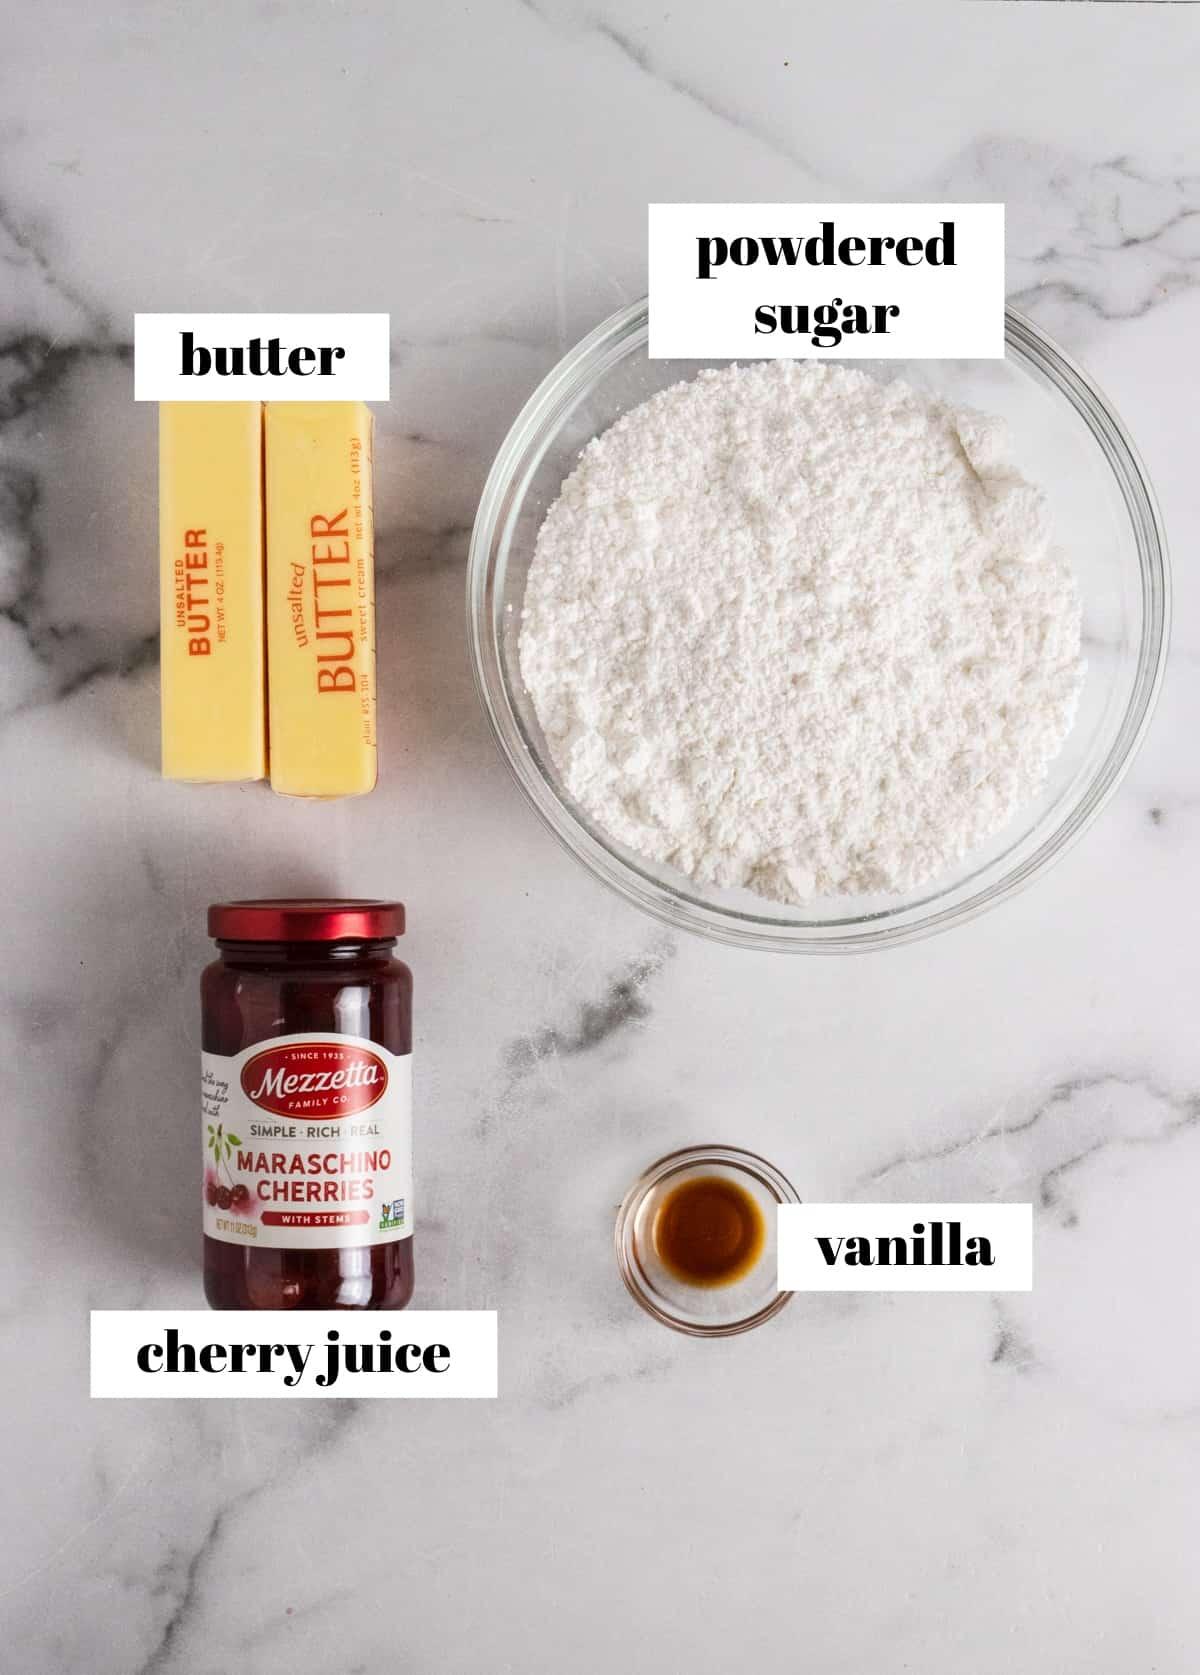 Butter, powdered sugar, vanilla and jar of maraschino cherries labeled on counter.